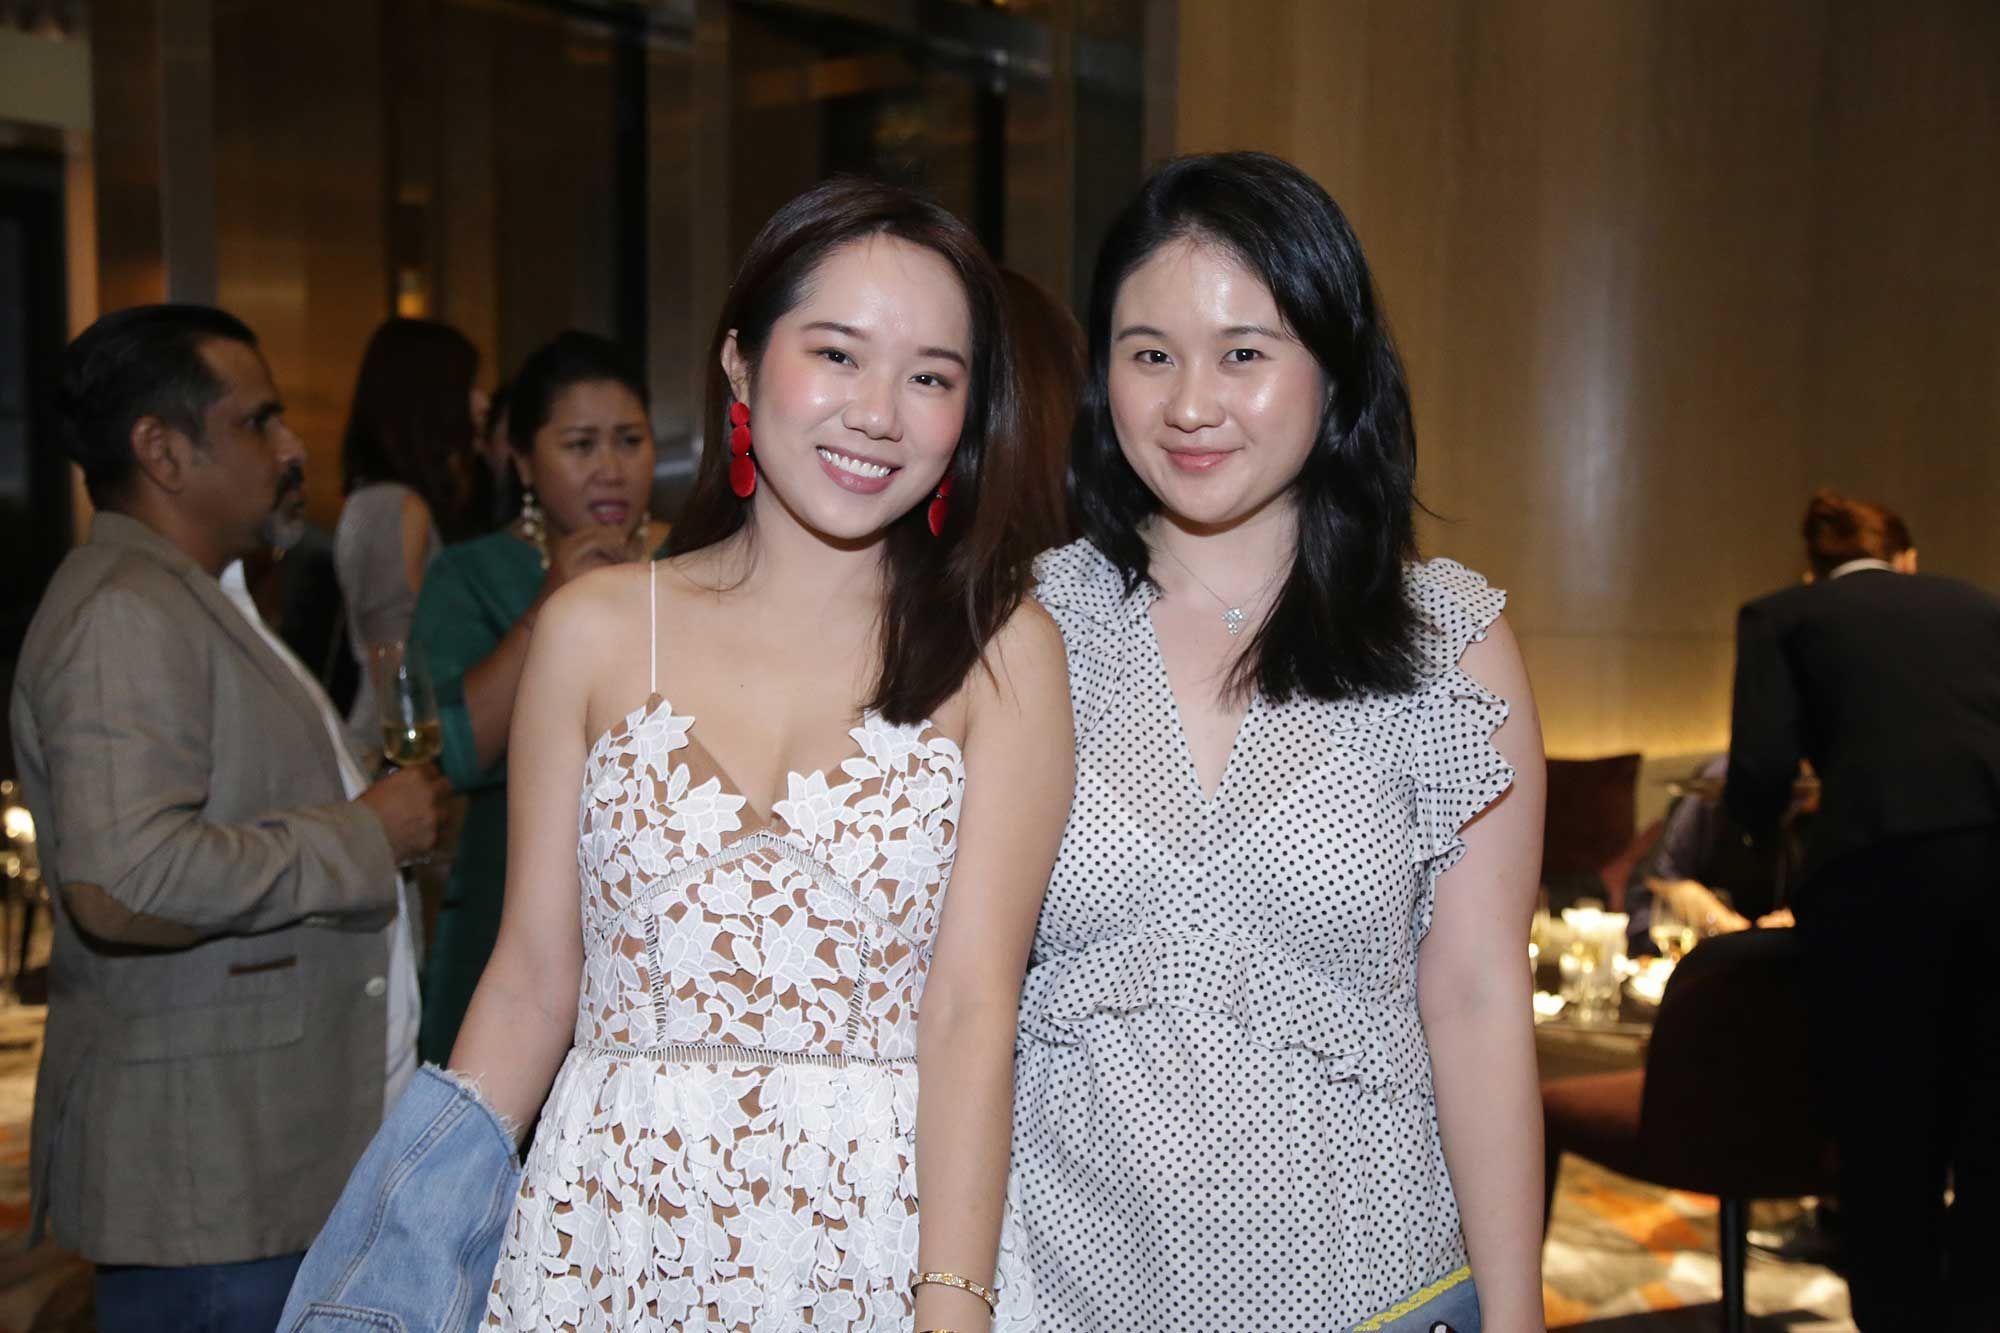 Jessica Lee and Pei Jun Tan